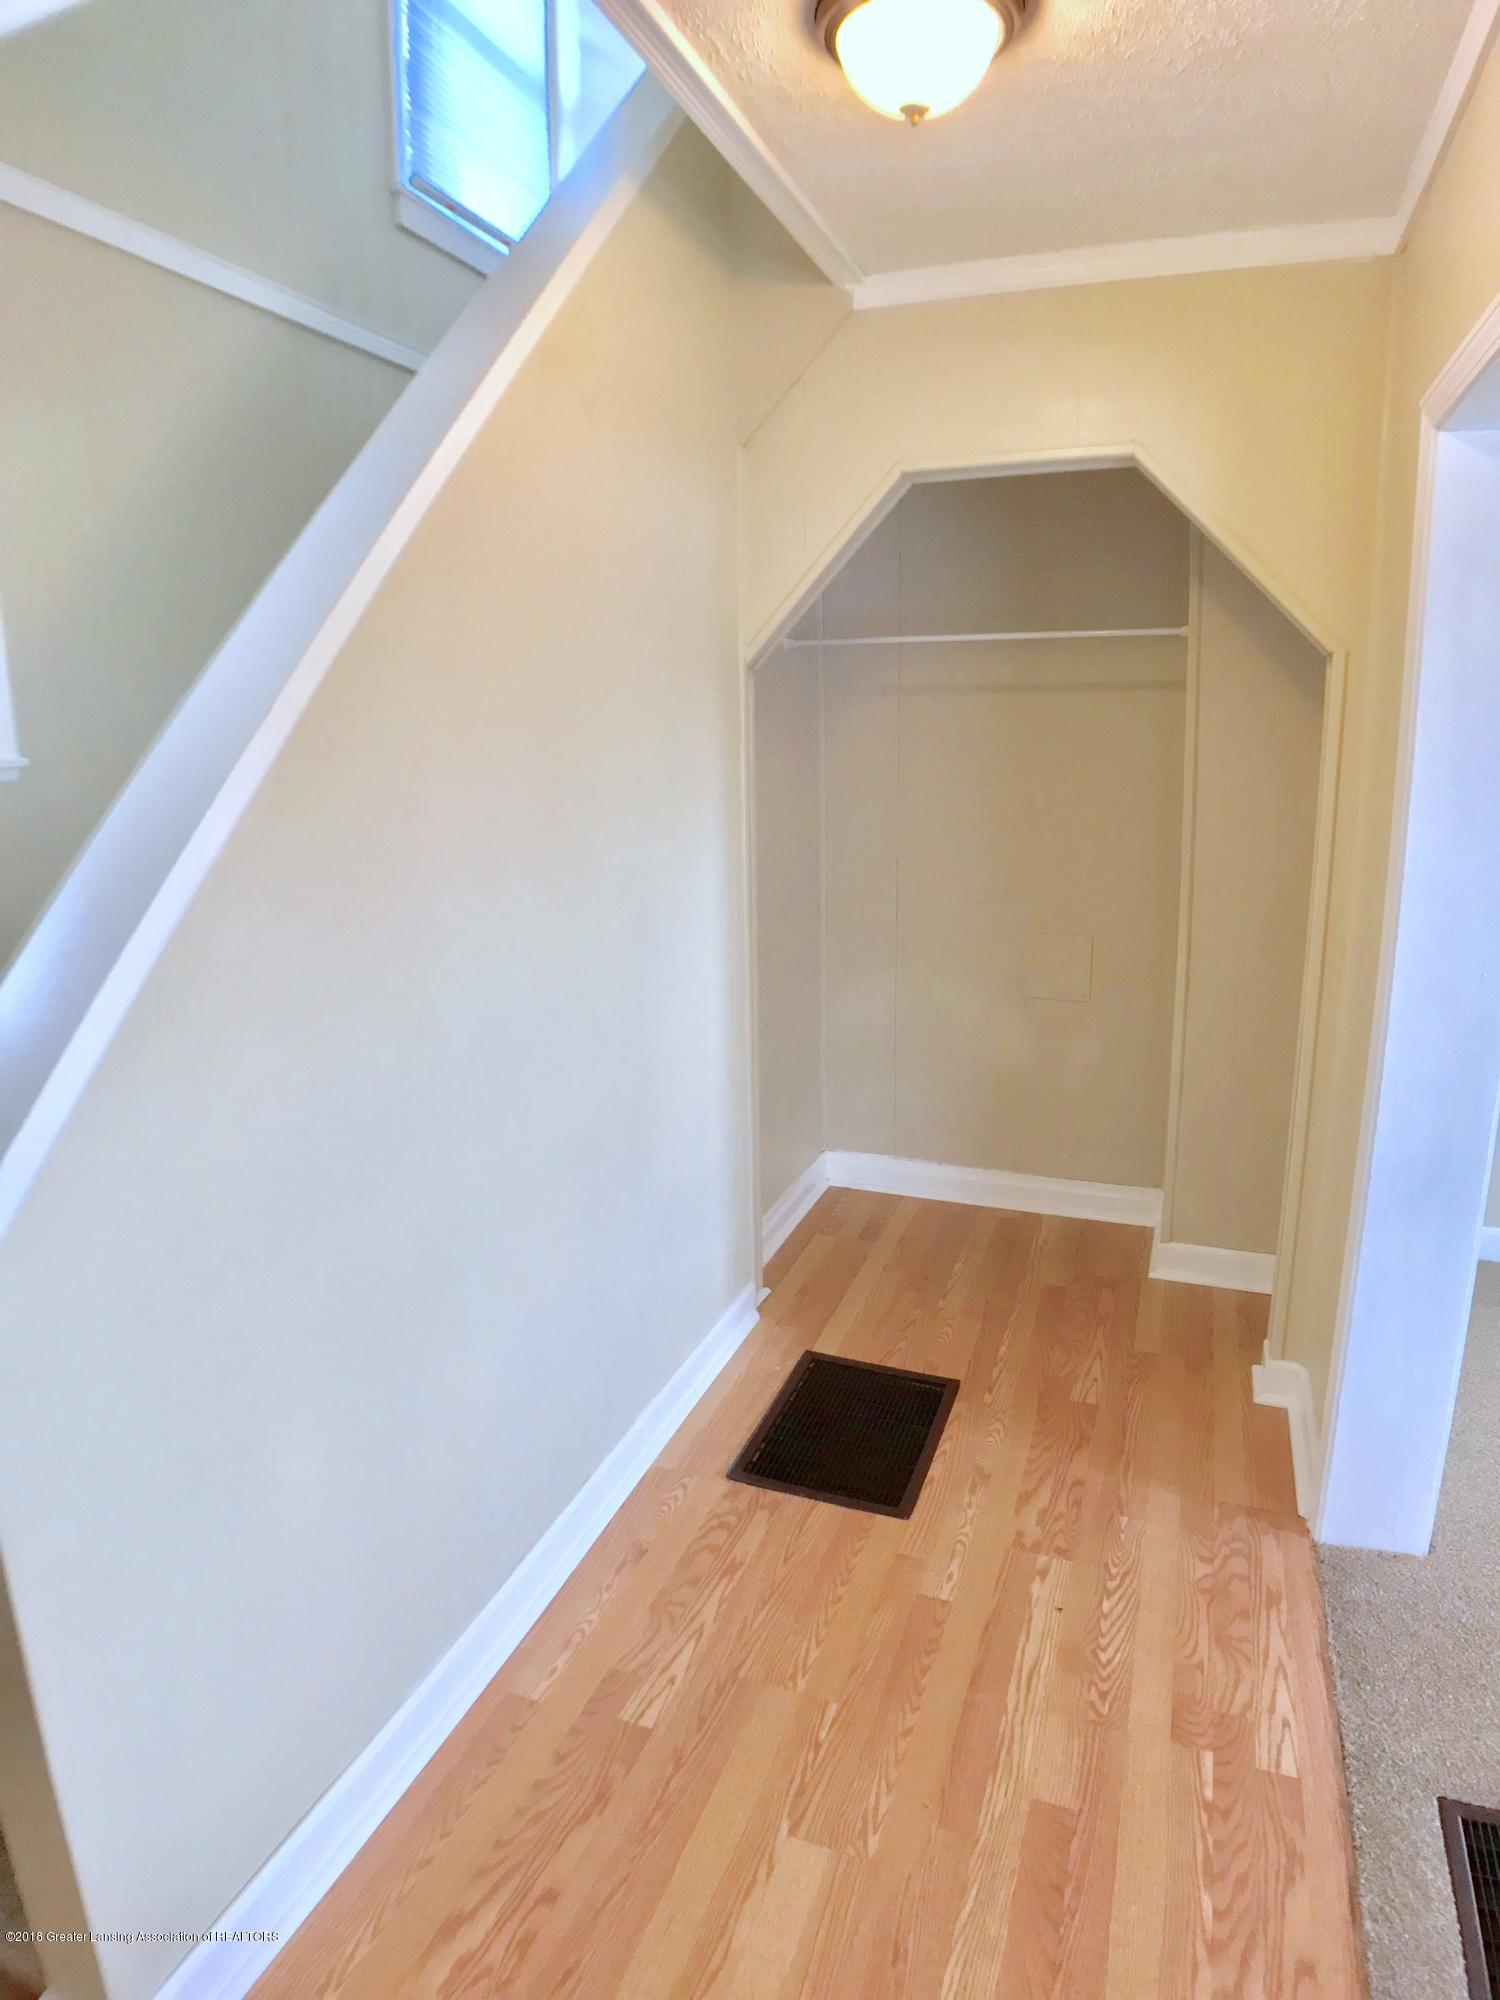 714 N Pine St - Foyer - 3